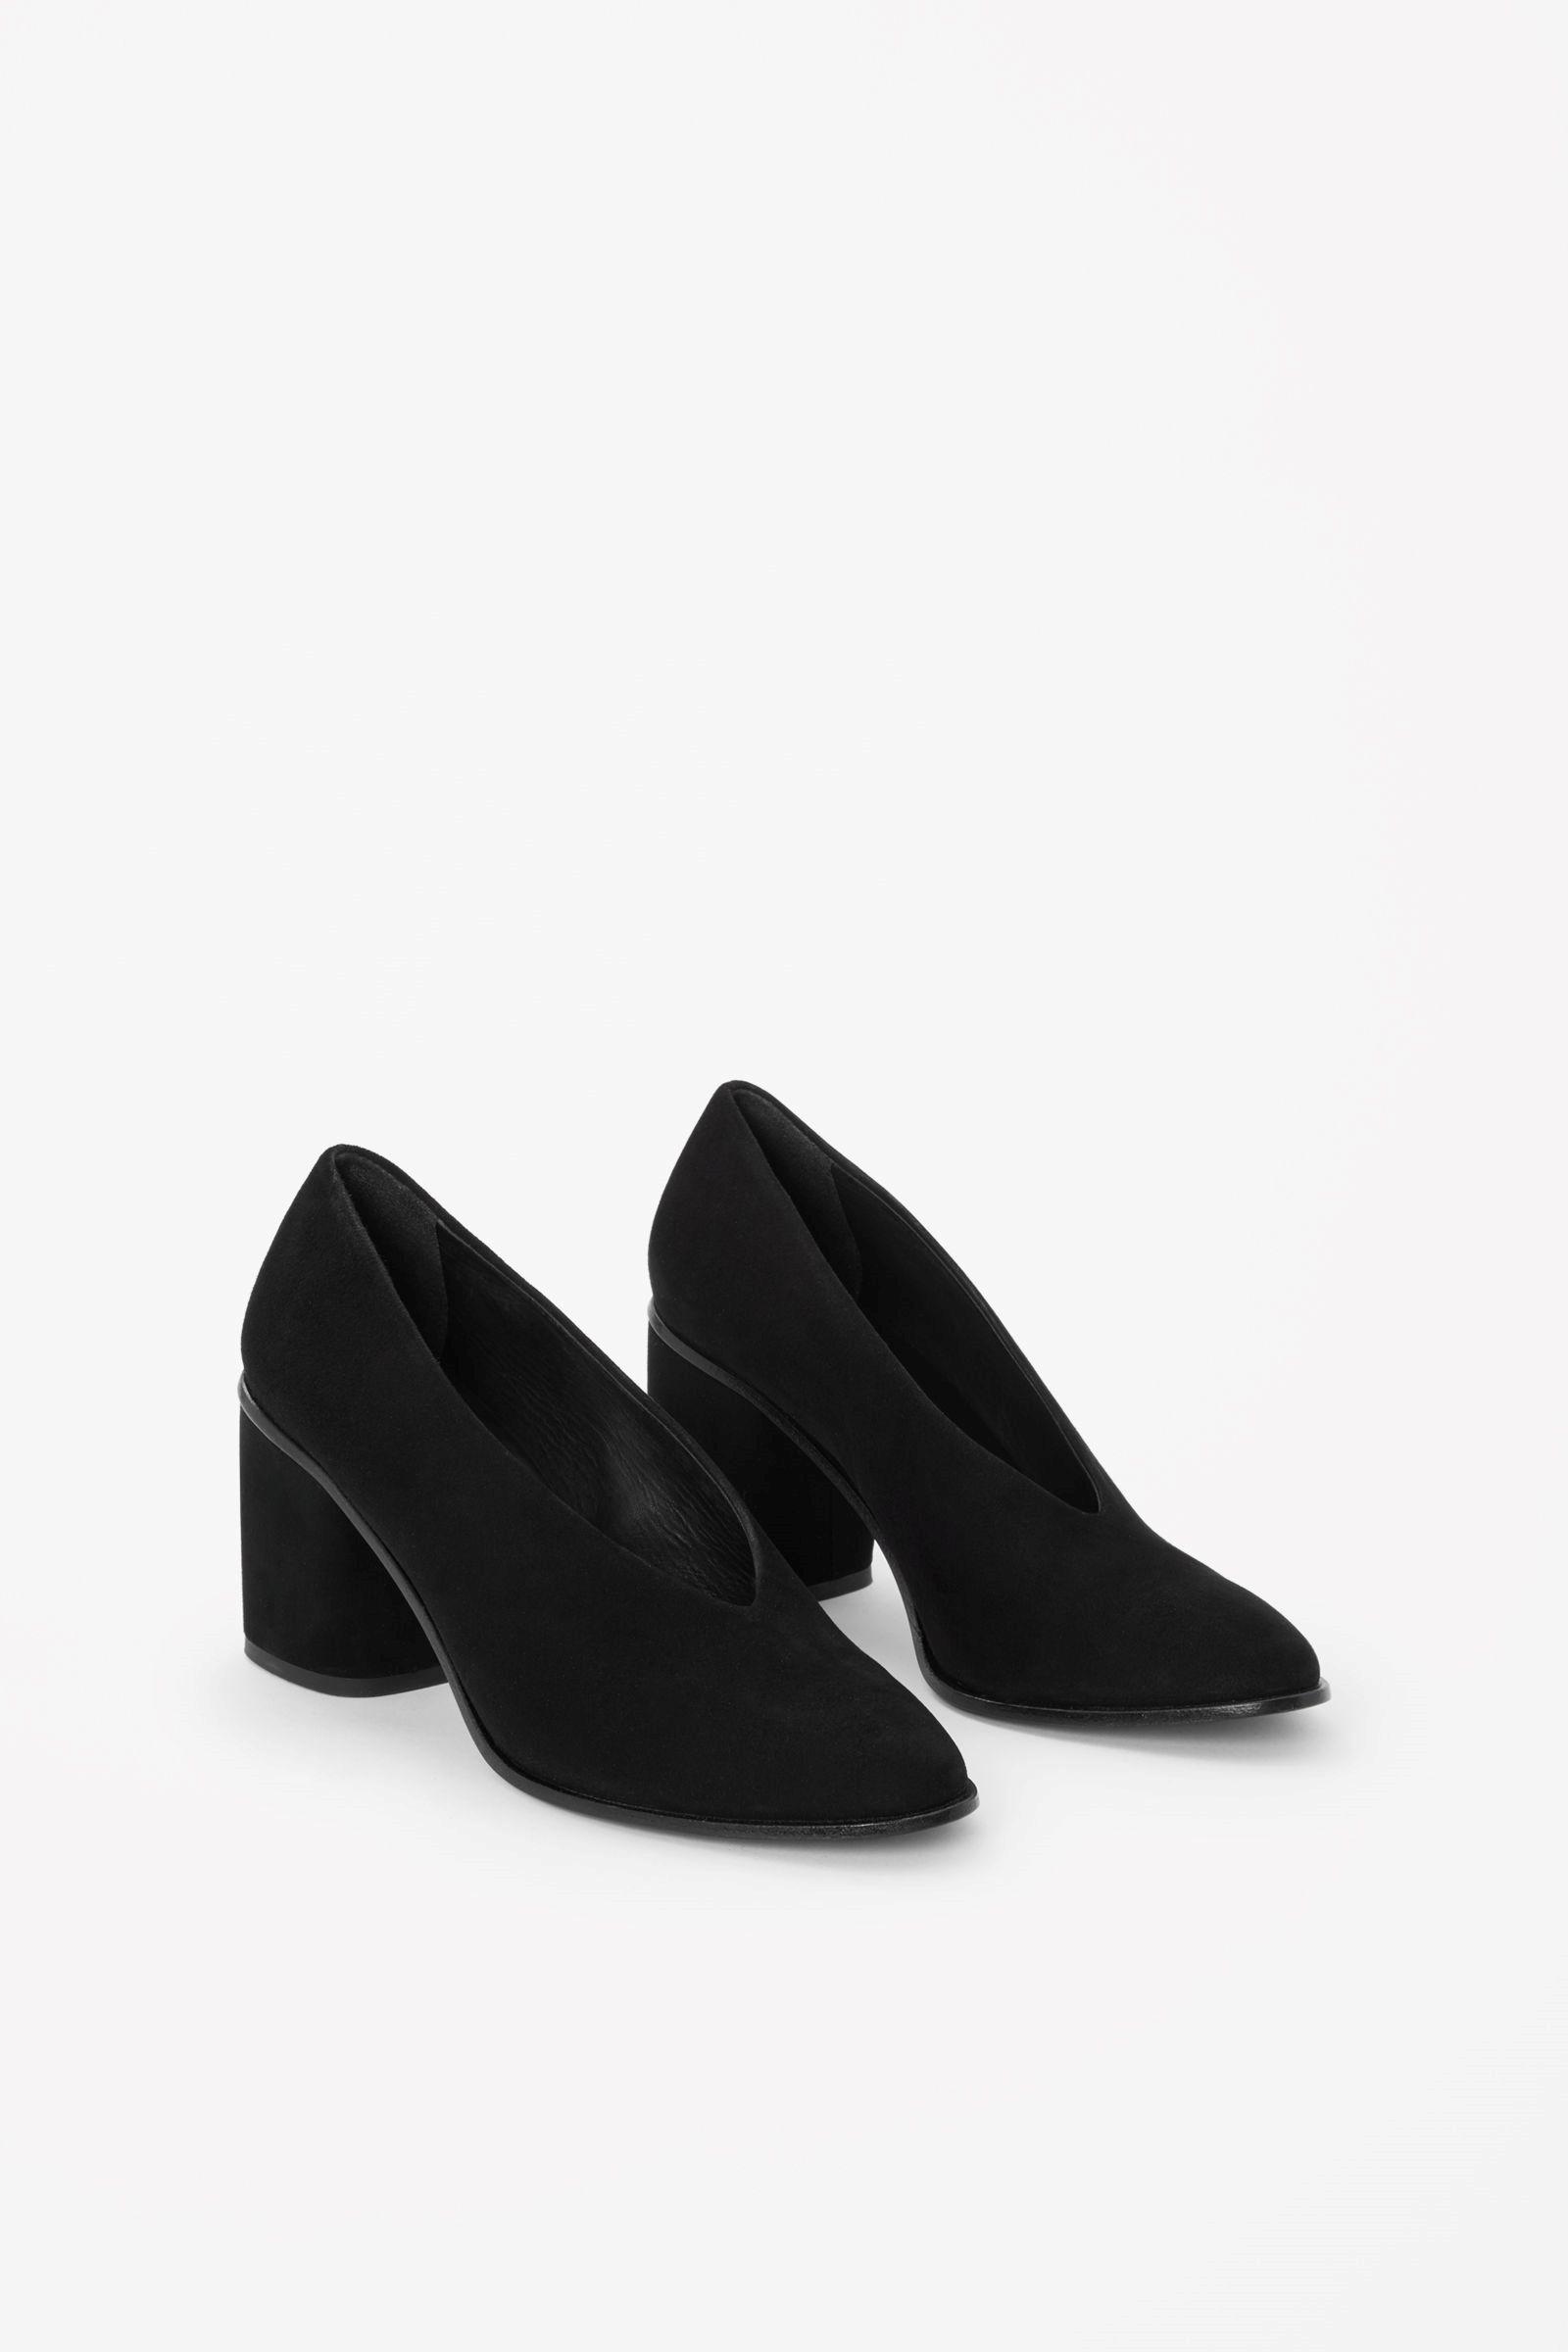 b37b0f569920 COS image 2 of Chunky heel suede pumps in Black